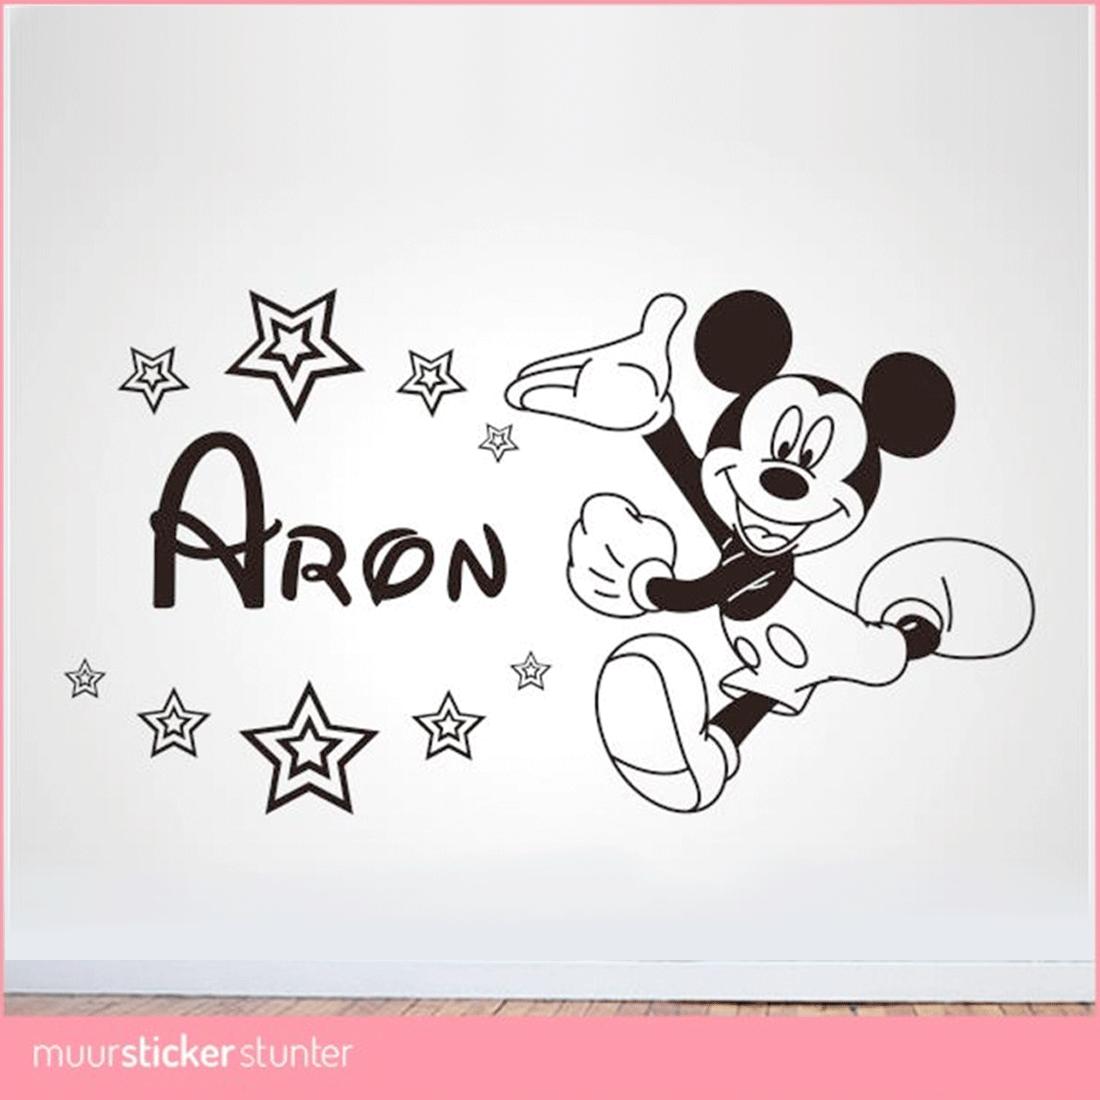 mickey-mouse-muursticker-zwart-kinderkamer-silhouette-disney-naamsticker